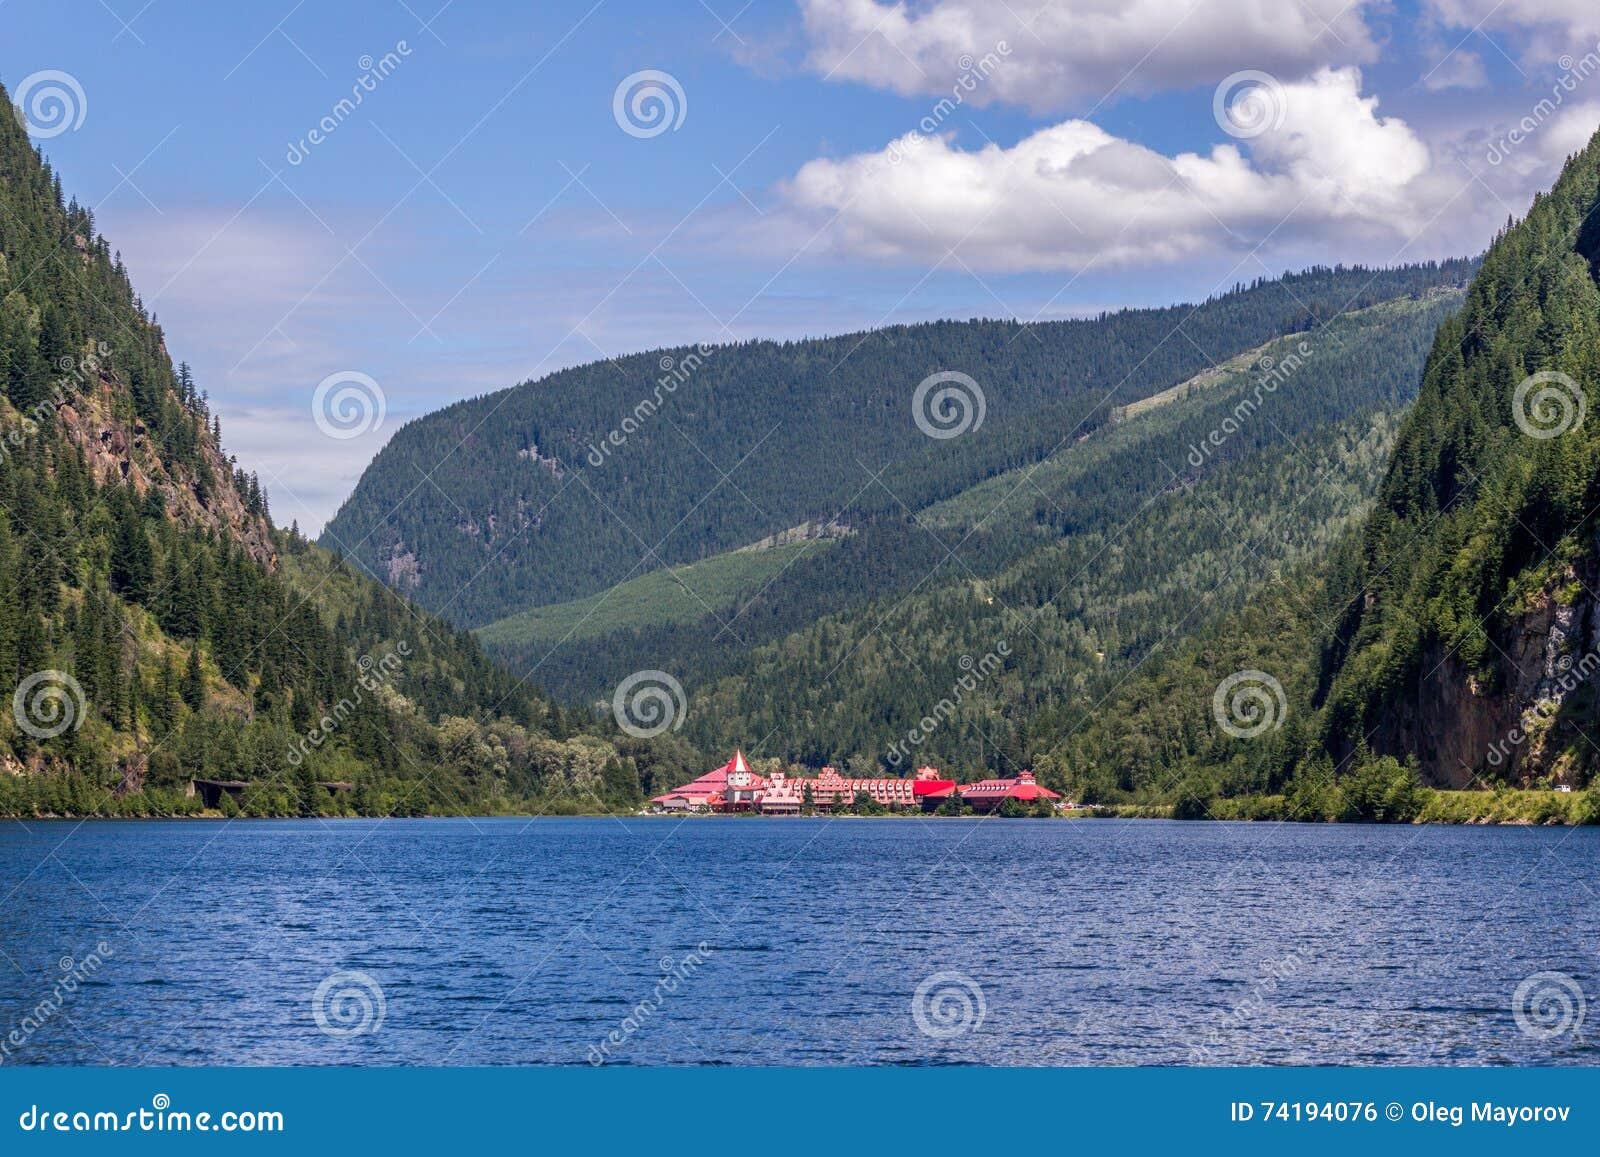 Revelstoke, Canada- July 2, 2016. Three Valley Gap Chateau